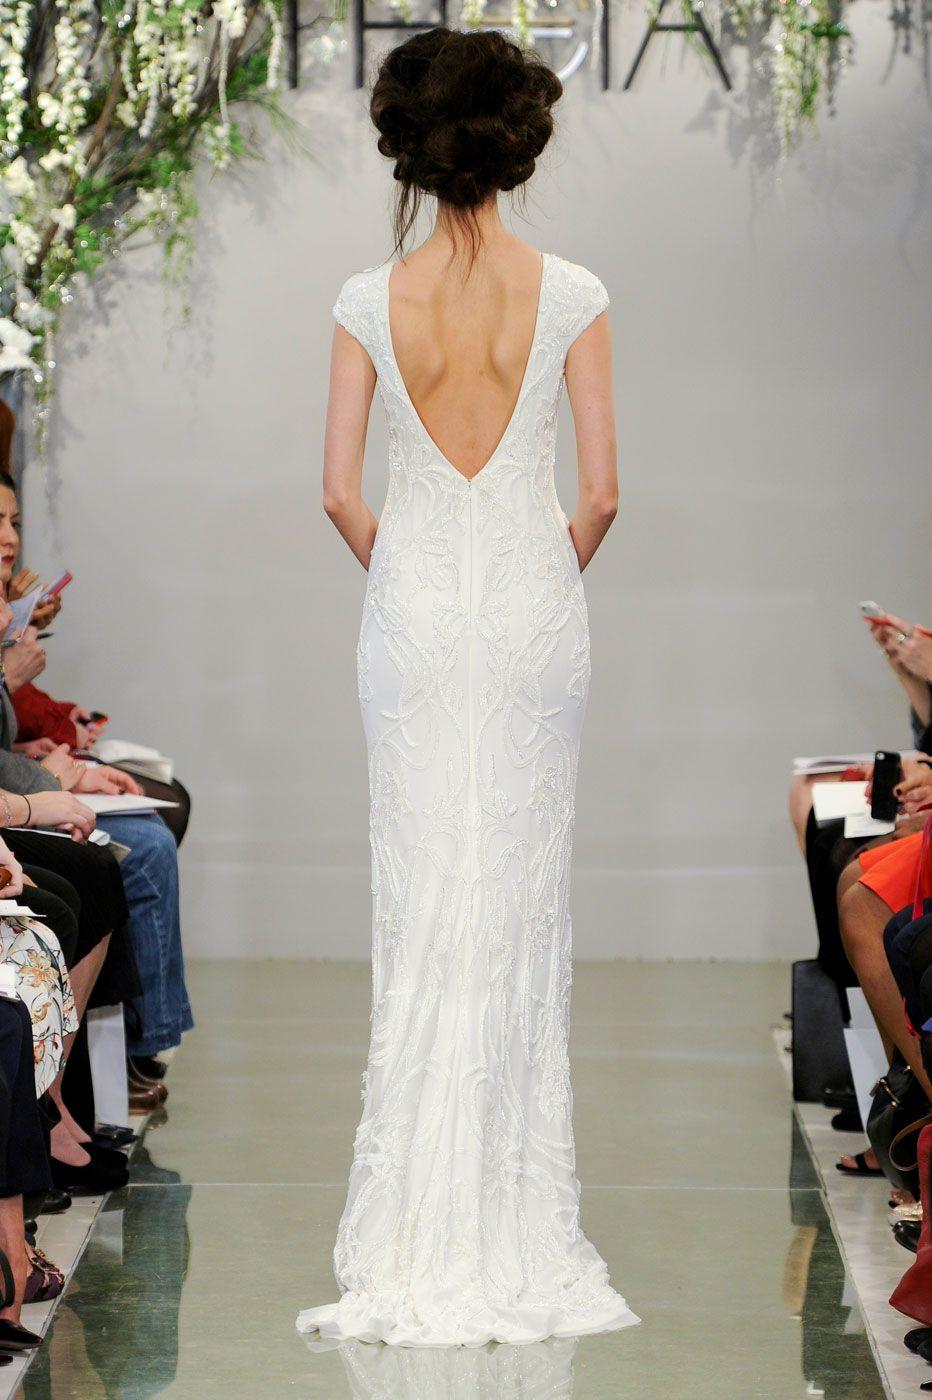 Styles of wedding dresses   Wedding Dresses to Inspire Any Modern Bride  Wedding dress